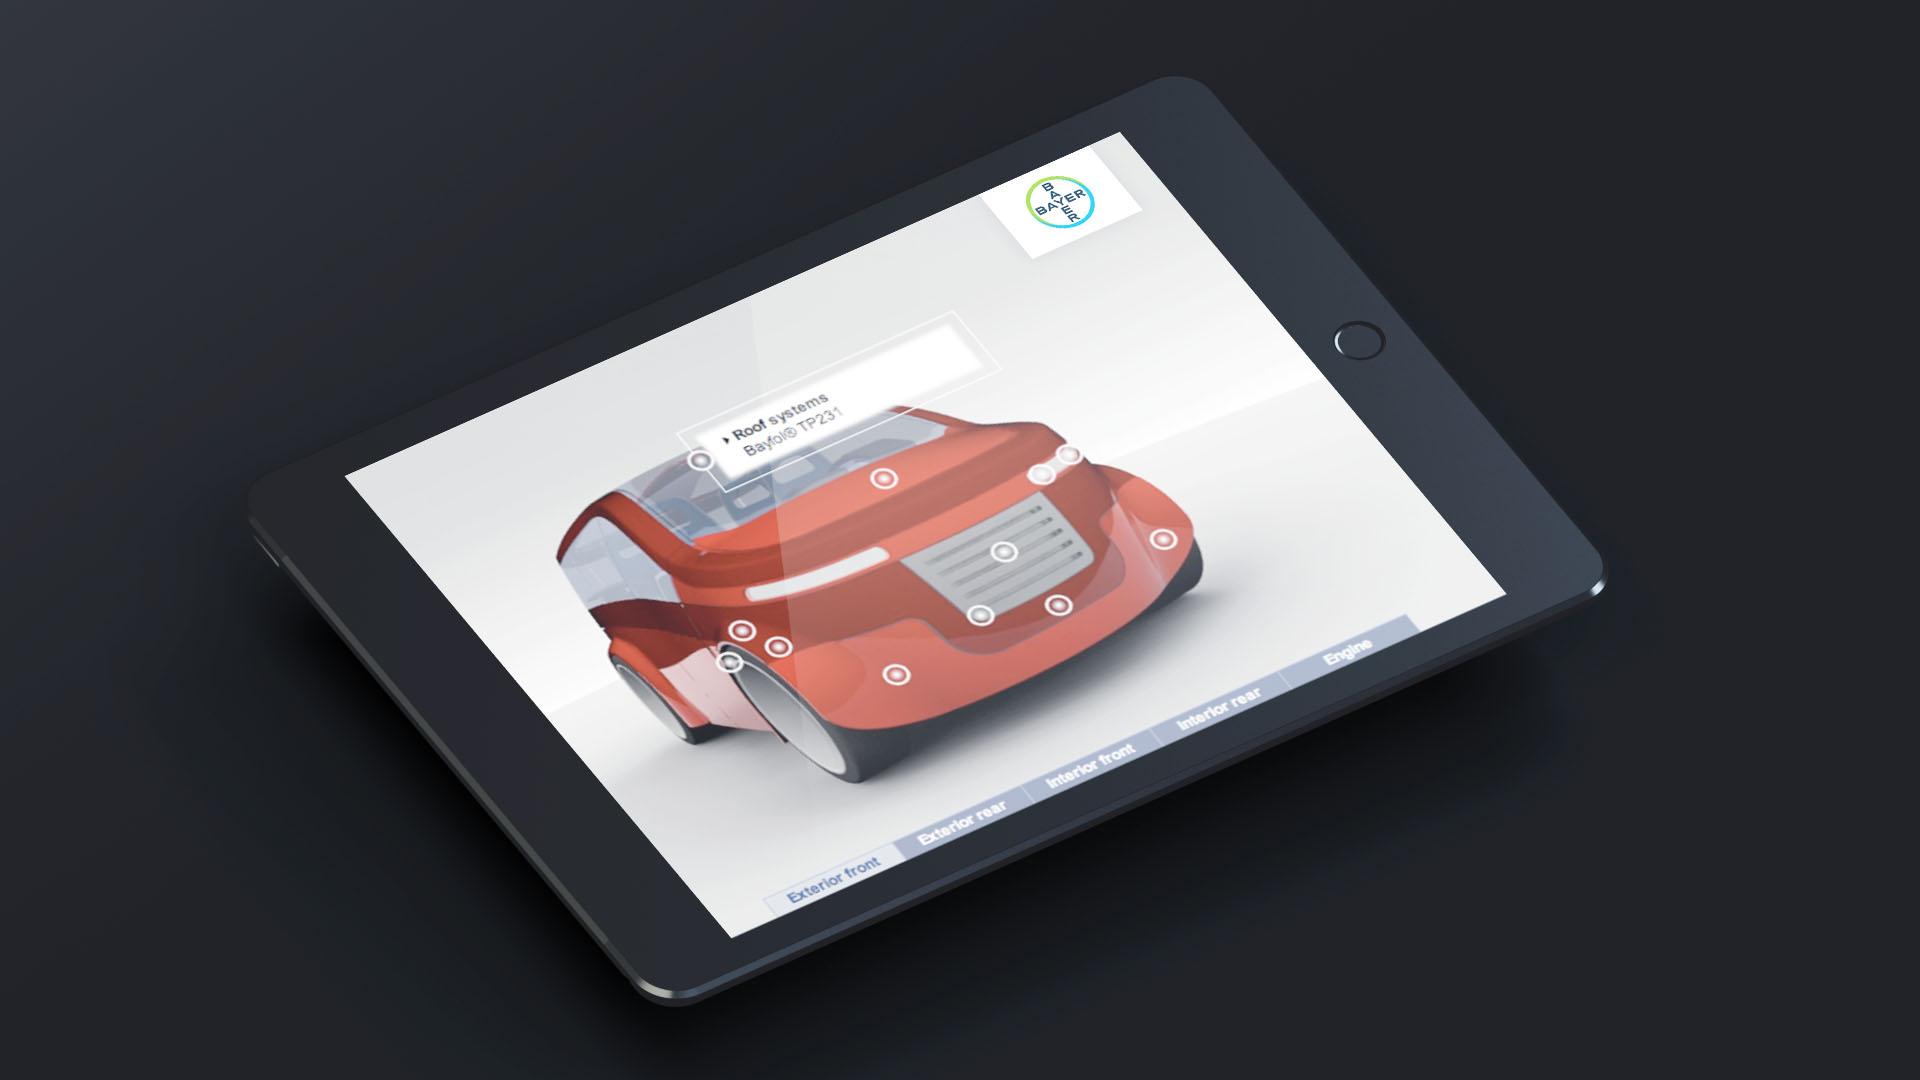 _iPads.jpg